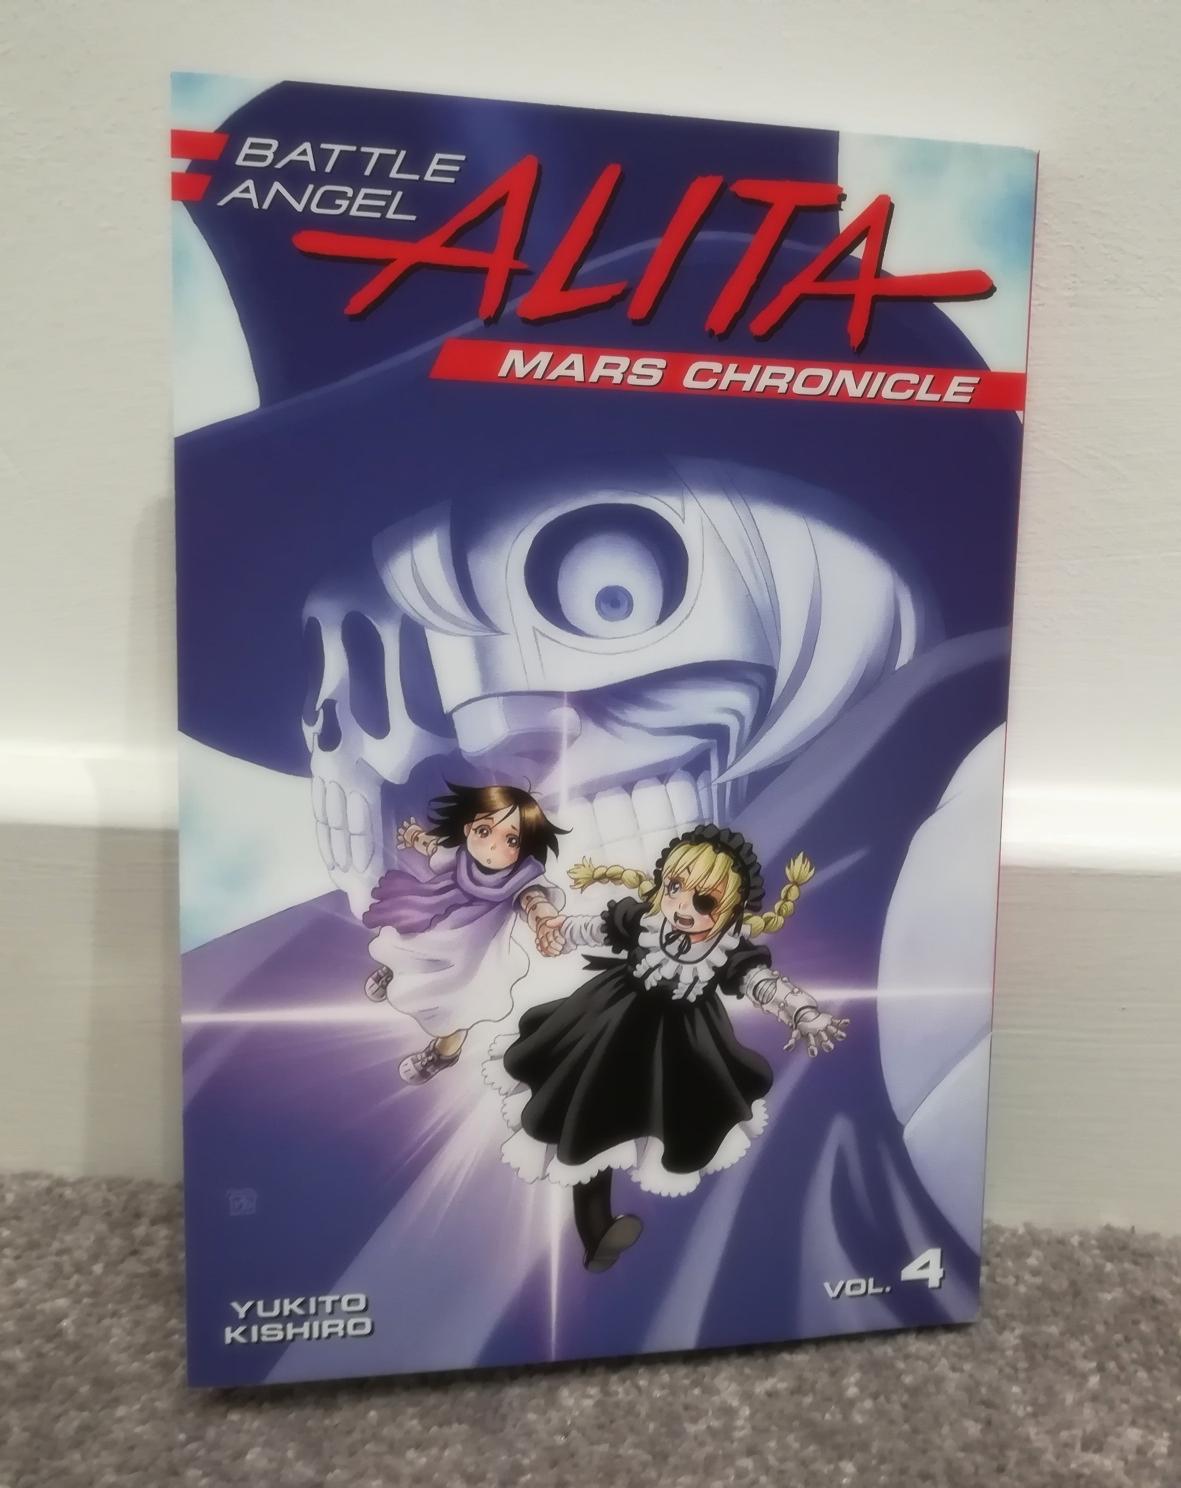 Battle Angel Alita: Mars Chronicle Vol. 4